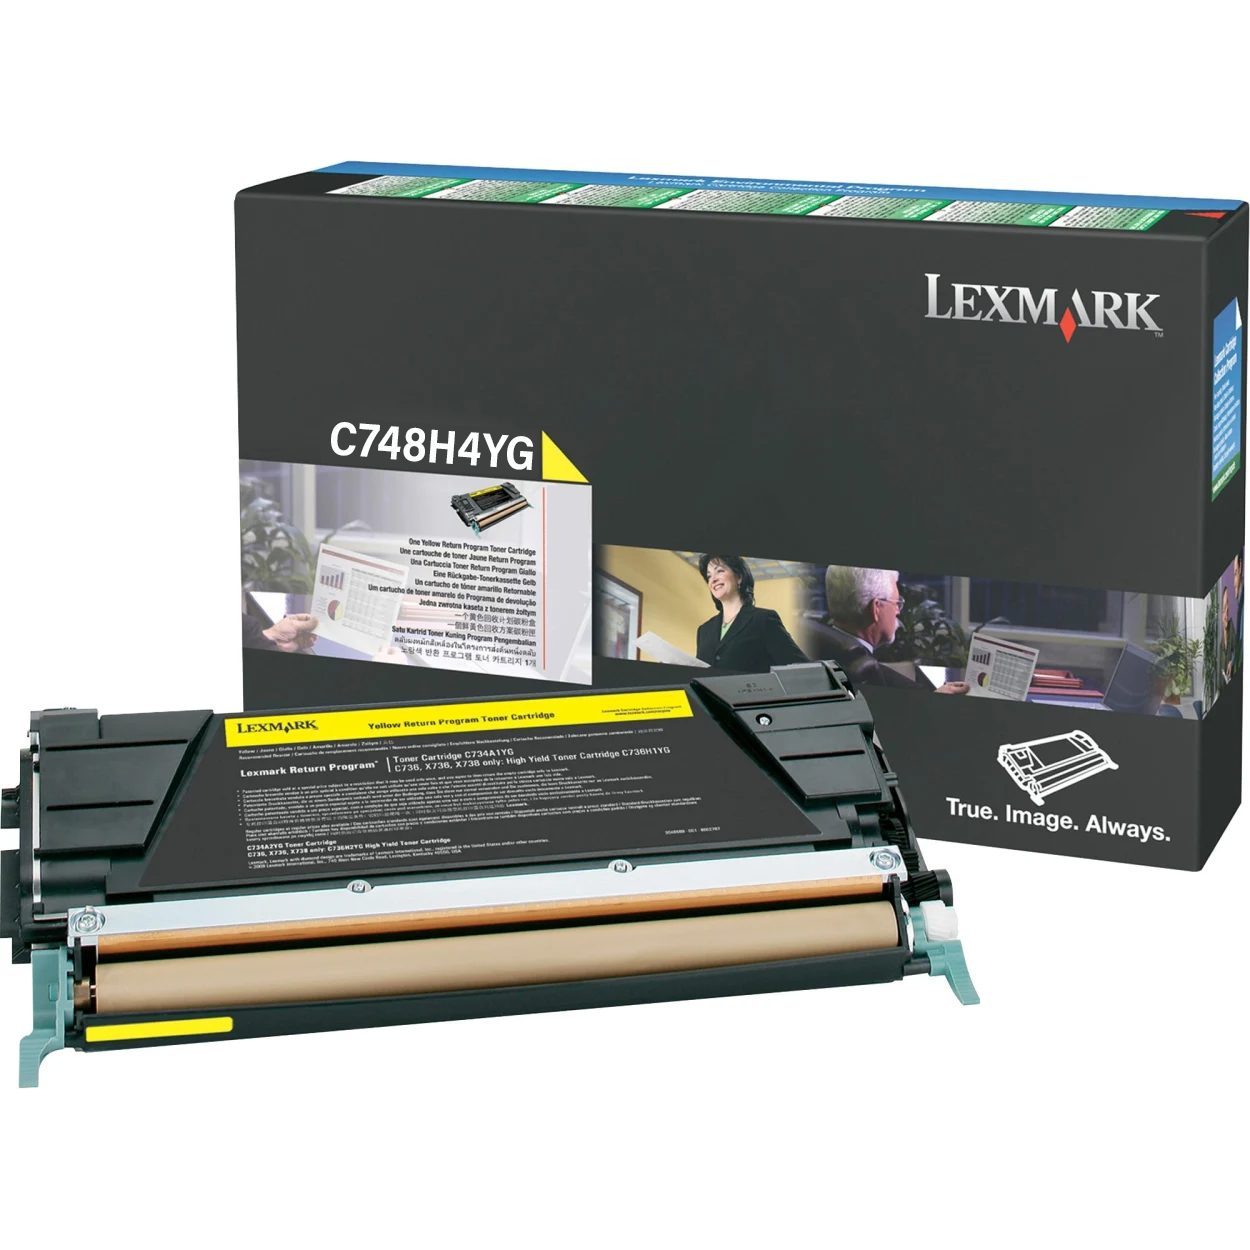 Original Lexmark C748H4YG C748 Yellow Return Program High-Yield Toner Cartridge Taa